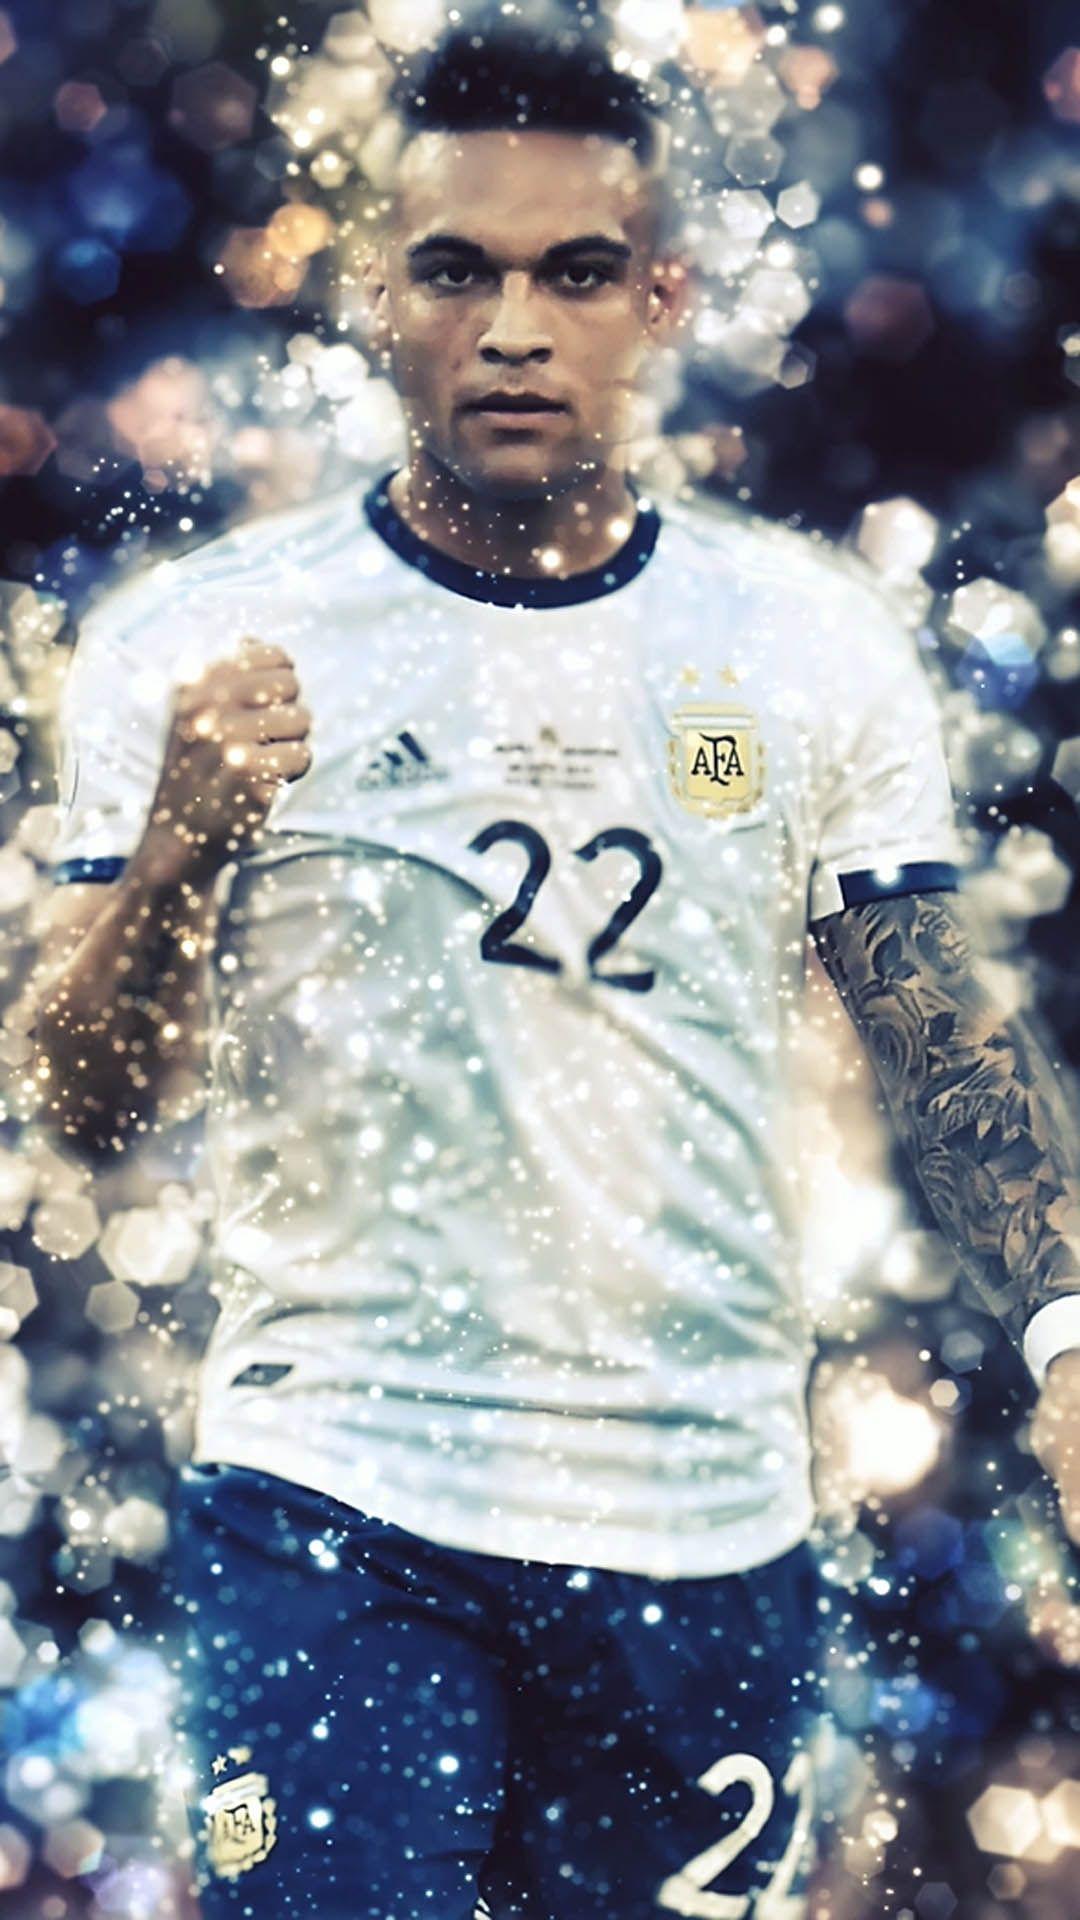 Lautaro Martinez Live Wallpaper HD 4K Android Futbol